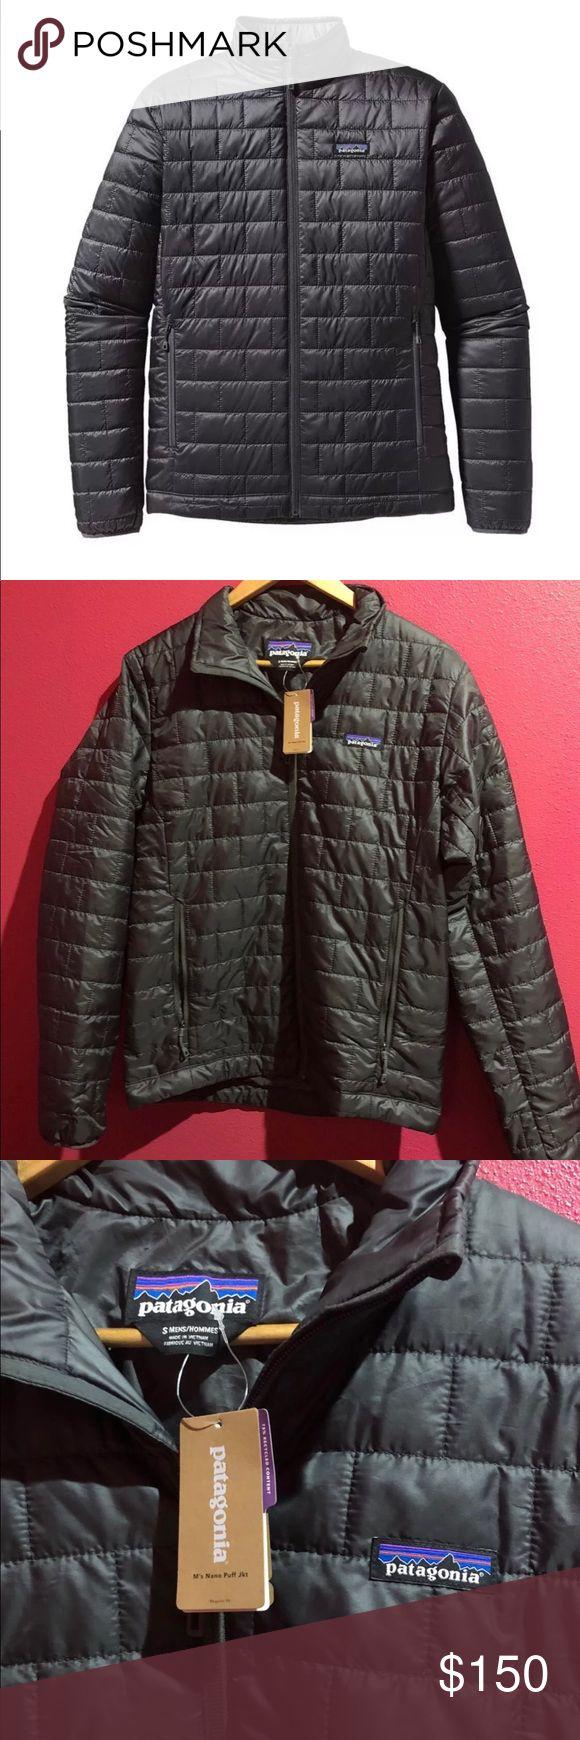 Patagonia Men's Nano Puffer Jacket Warm, windproof, water